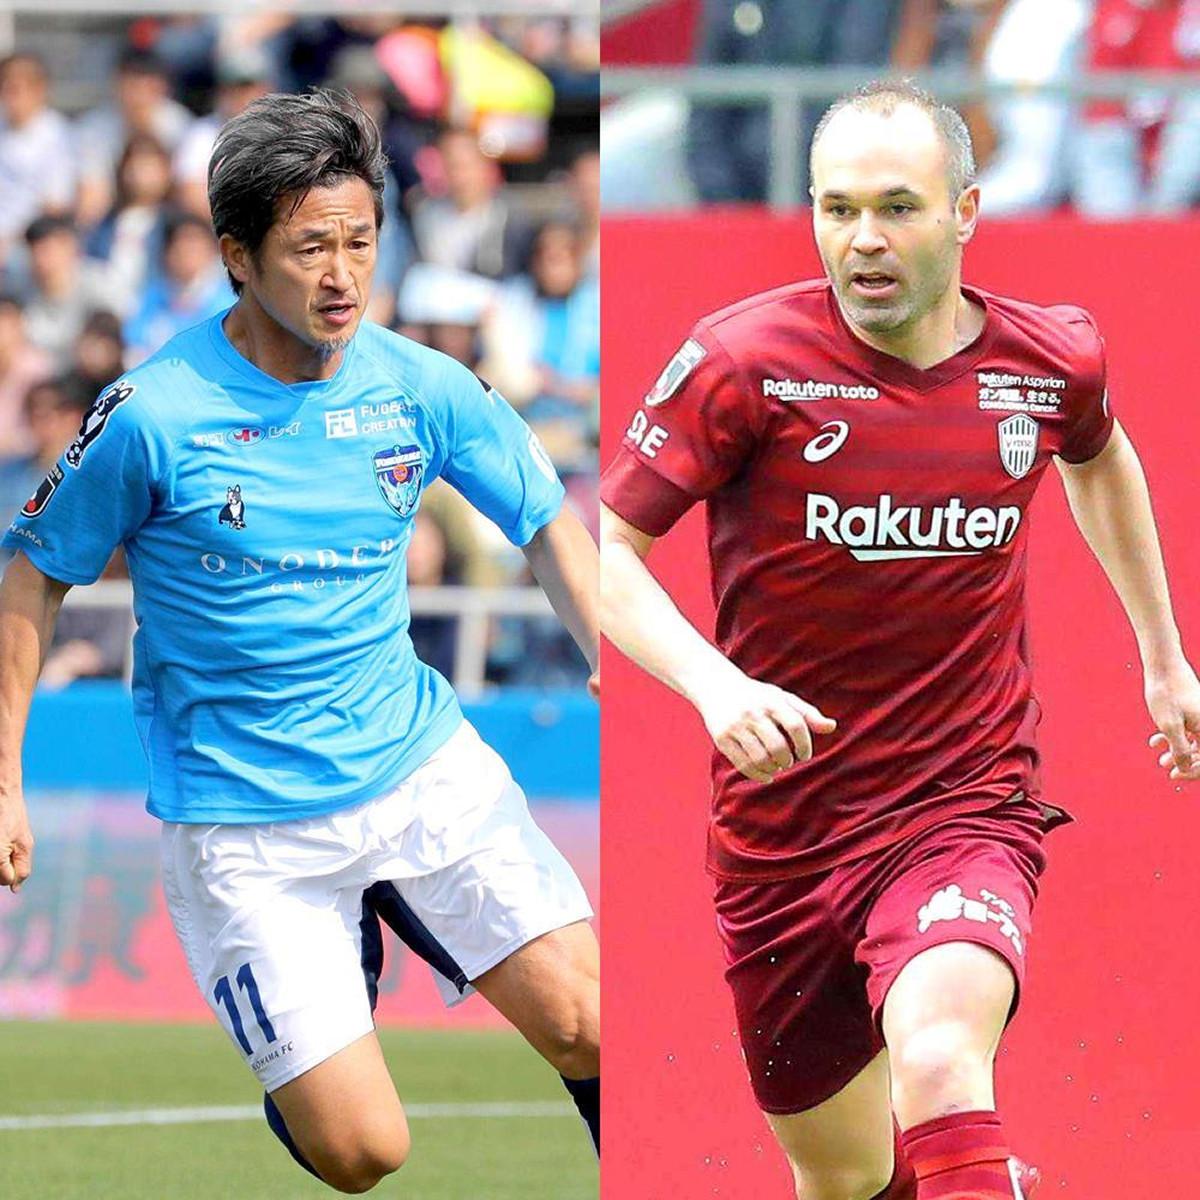 J1に昇格して気合が入る「キングカズ」こと横浜C・三浦(左)、10年のW杯で優勝した元スペイン代表の神戸・イニエスタ